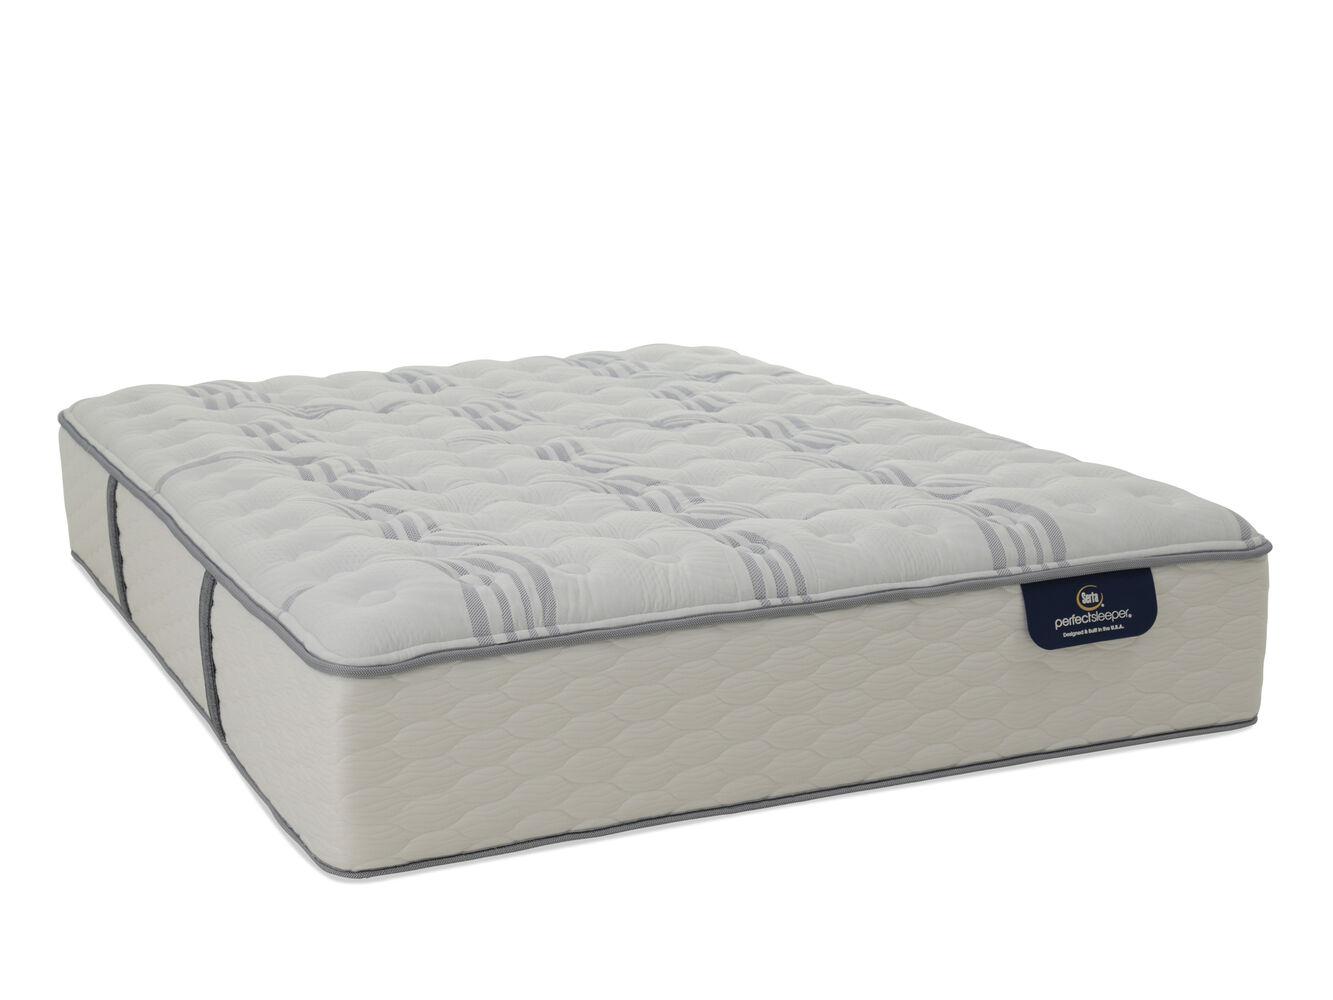 Serta Perfect Sleeper Ramsdell Firm Mattress